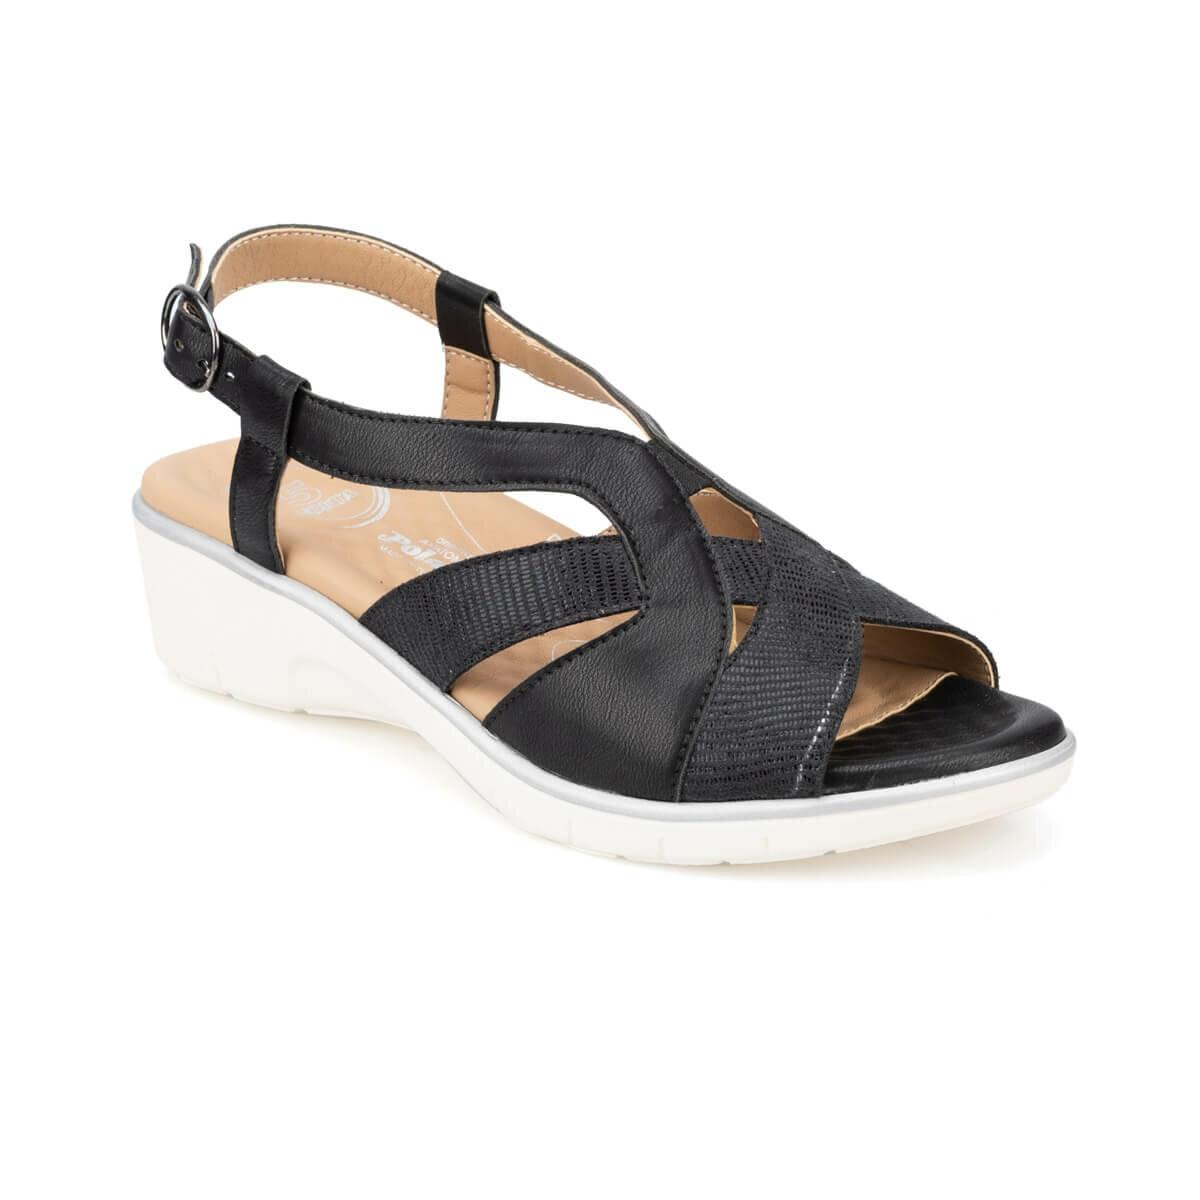 FLO 91.100701.Z Black Women Sandals Polaris 5 Point